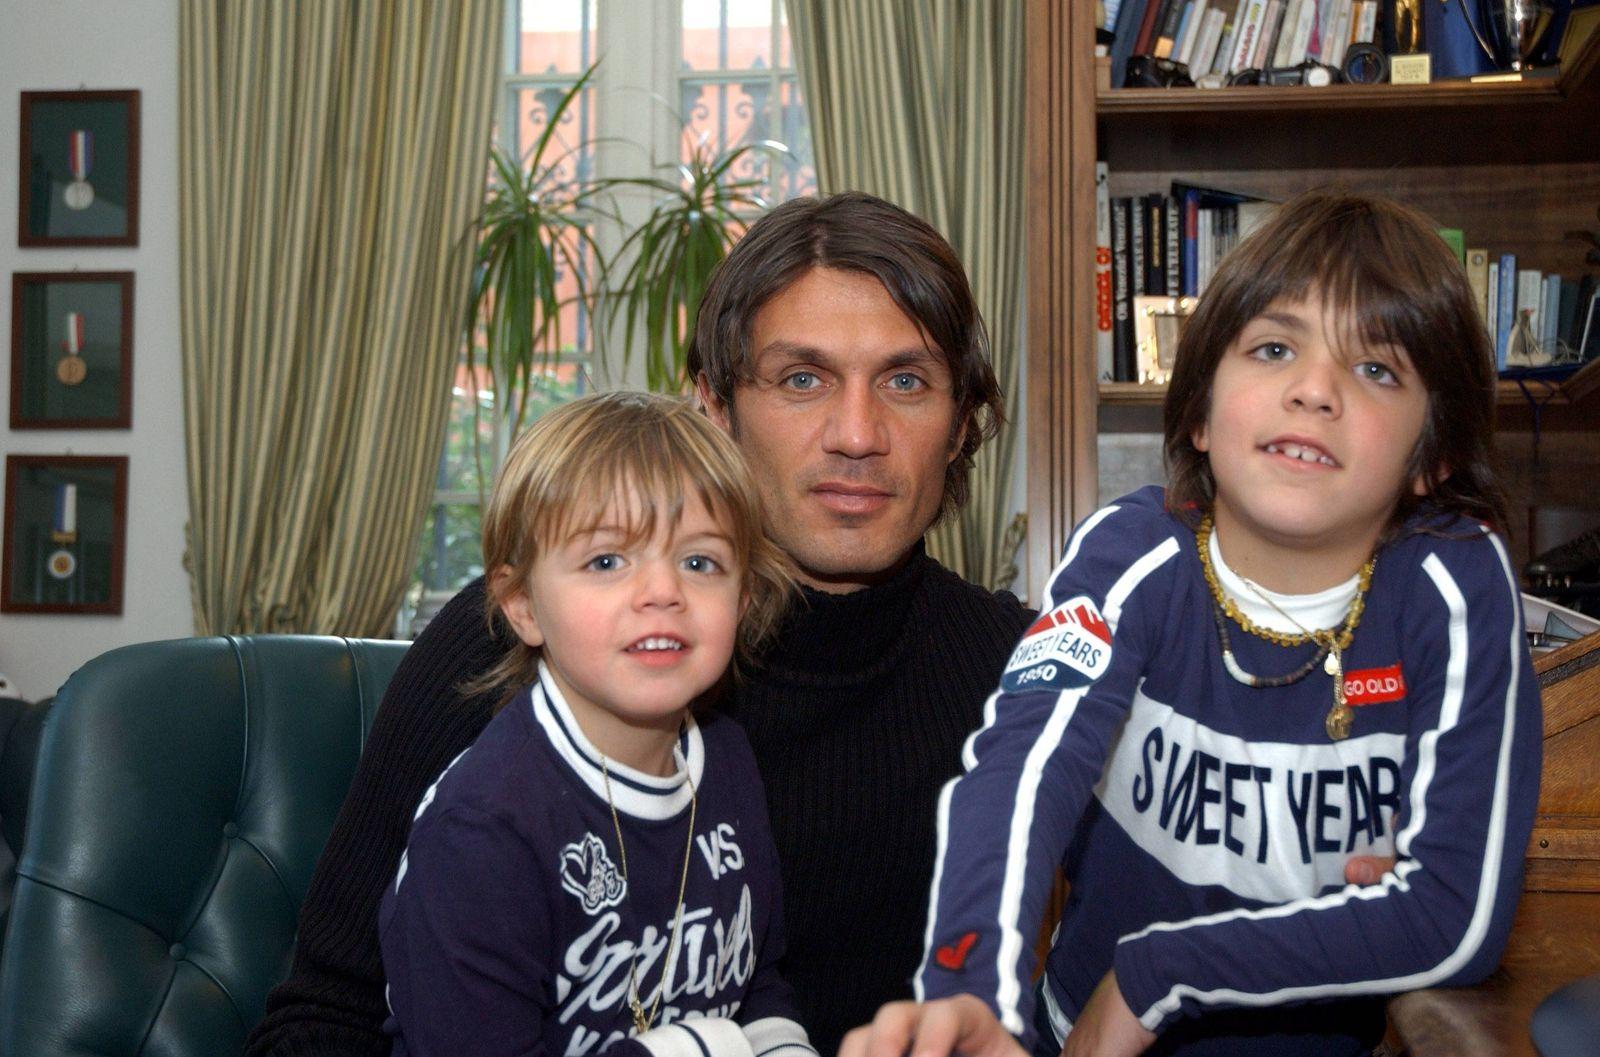 Paolo Maldini Italien AC Mailand mit den Kindern Christian und Daniel PUBLICATIONxNOTxINxITA